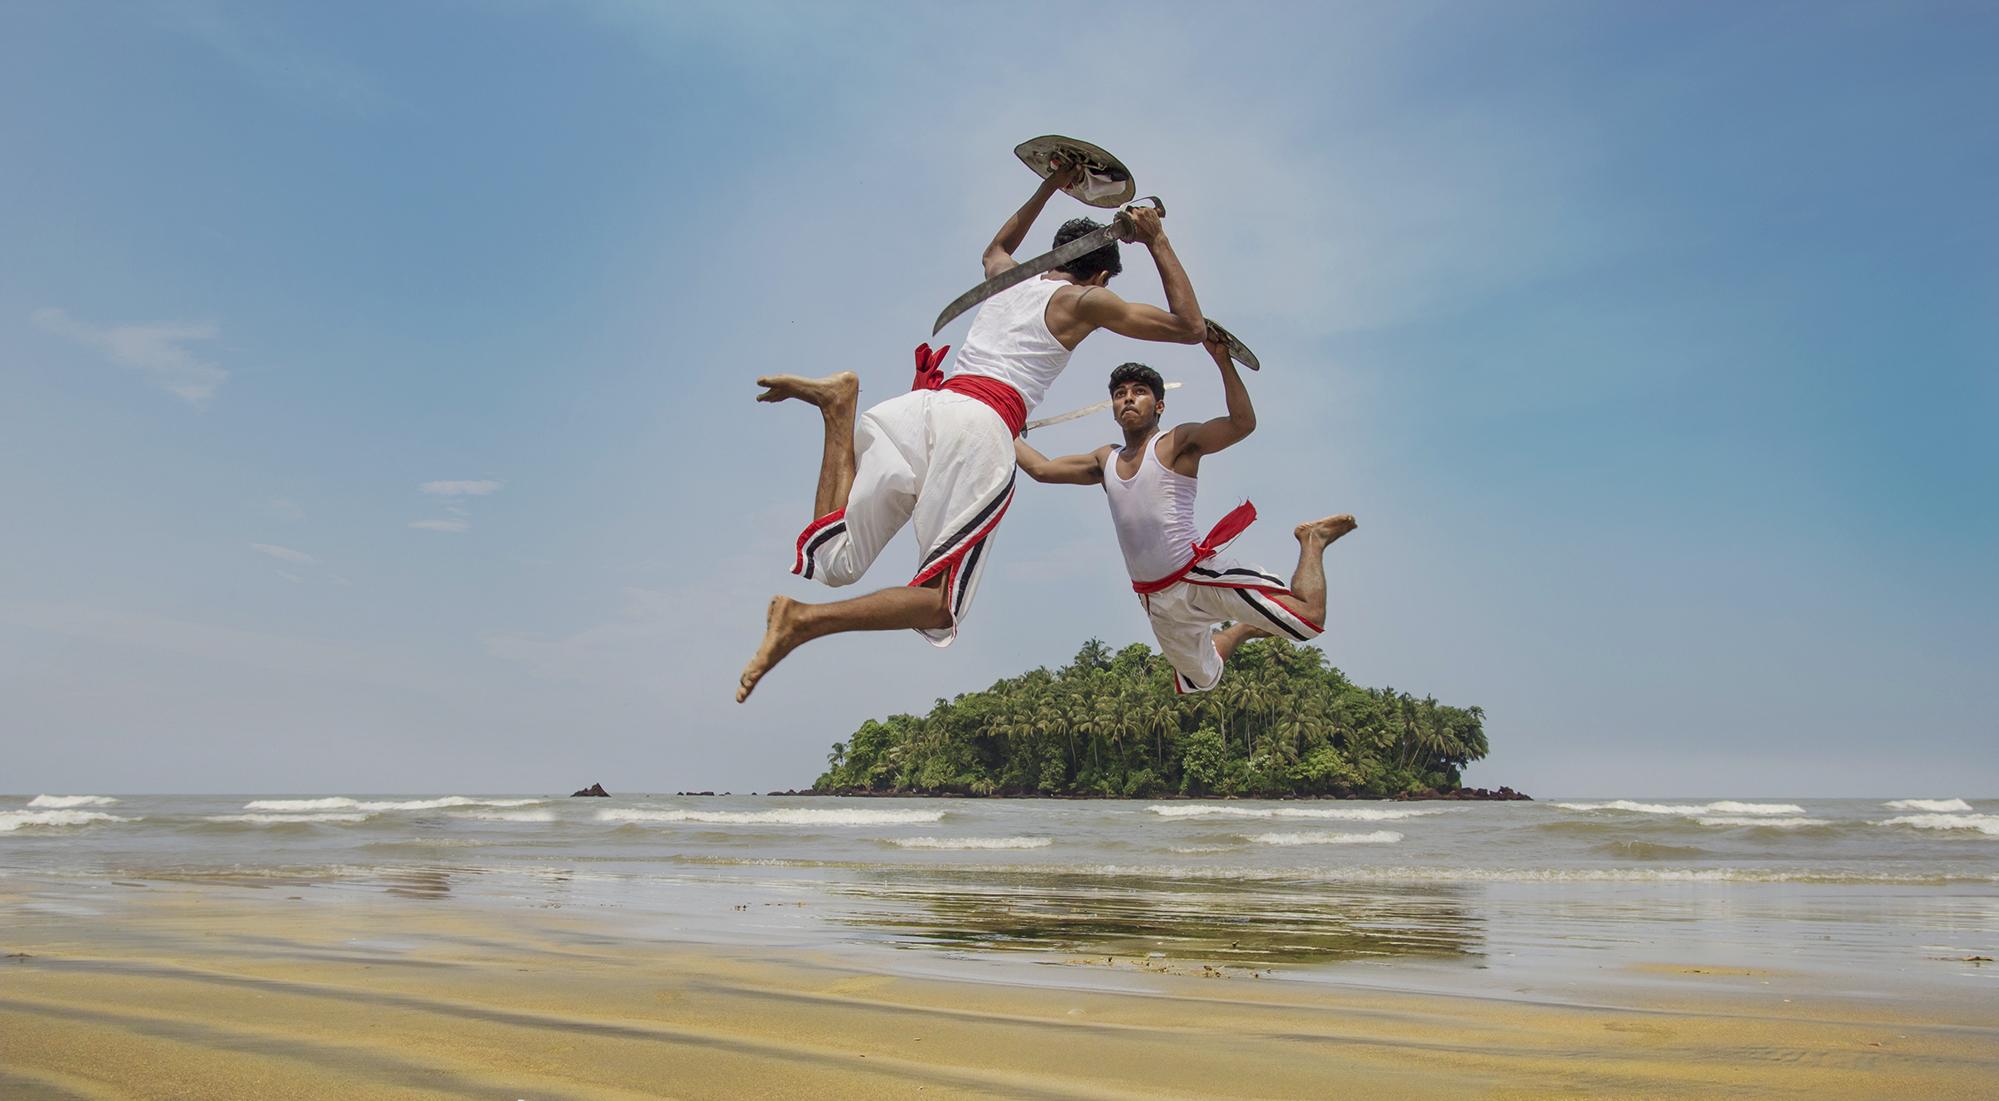 Kalaripayattu Mother of all Martial arts.Kalarippayattu is the martial art form of Kerala is regarded as the oldest of its kind in the world